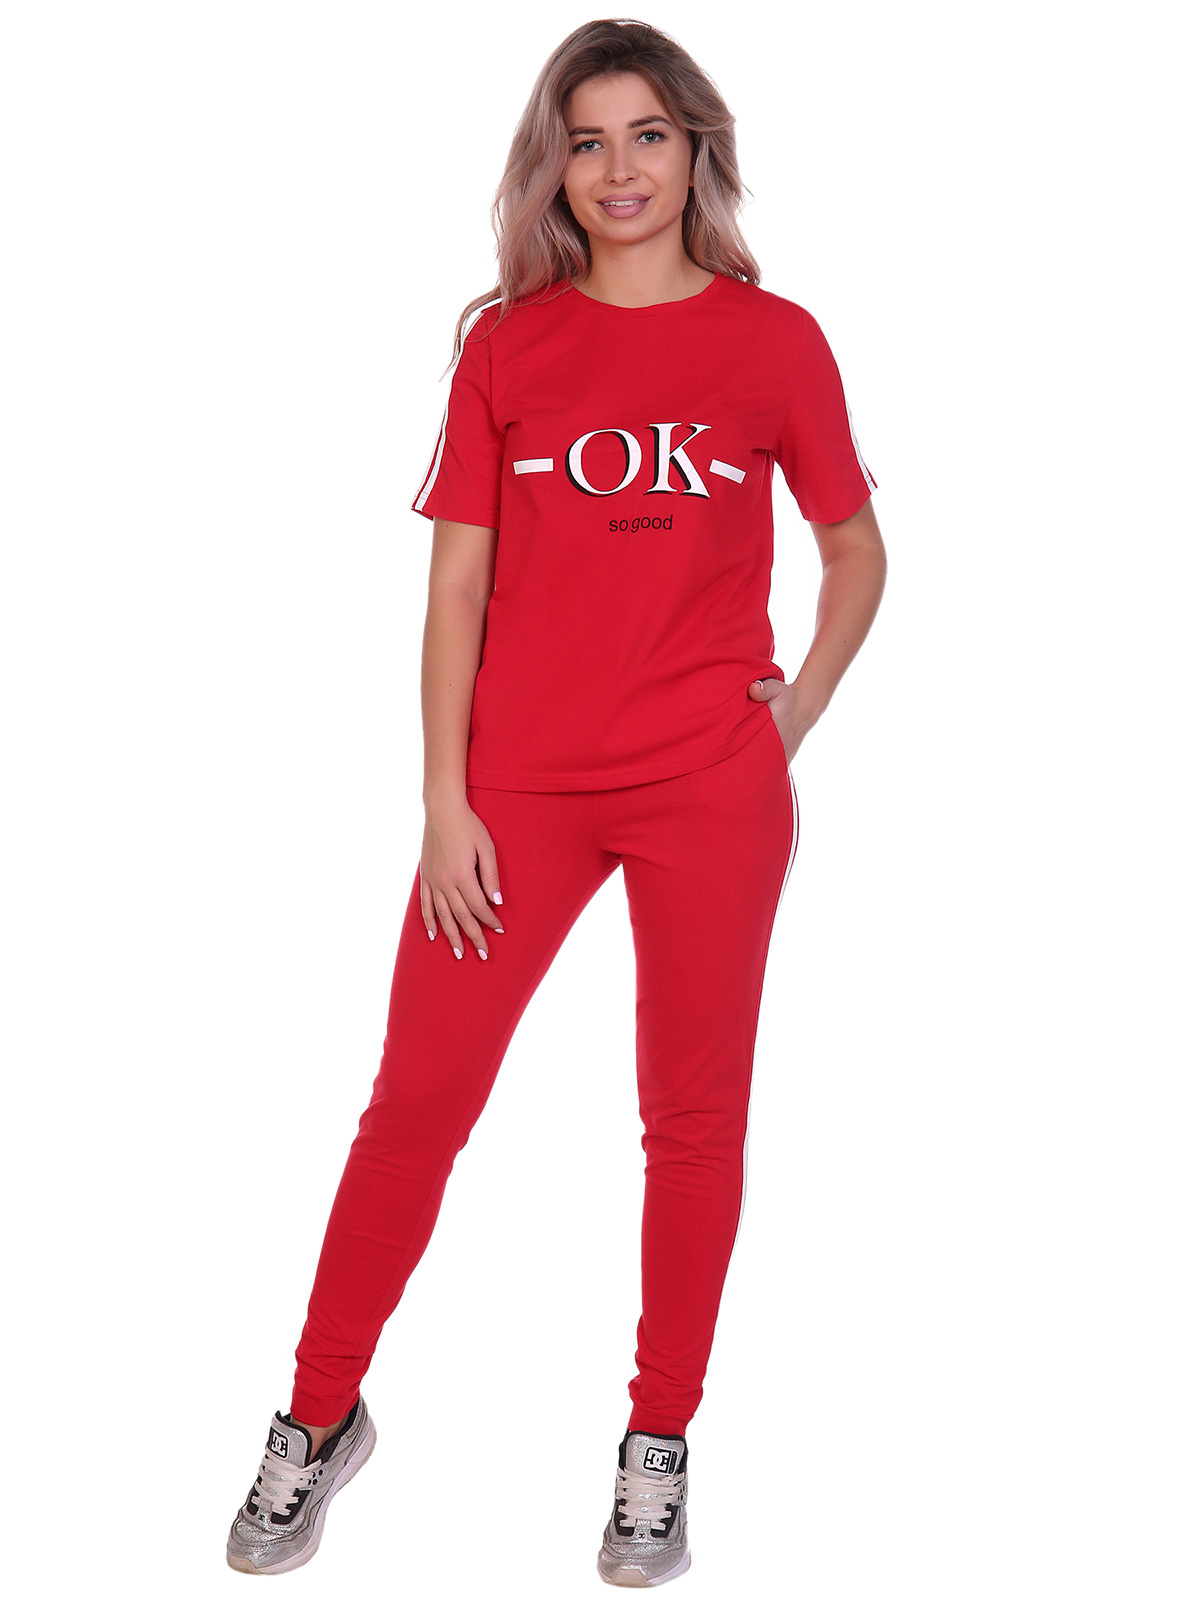 Жен. костюм арт. 16-0491 Красный р. 58 НСД Трикотаж